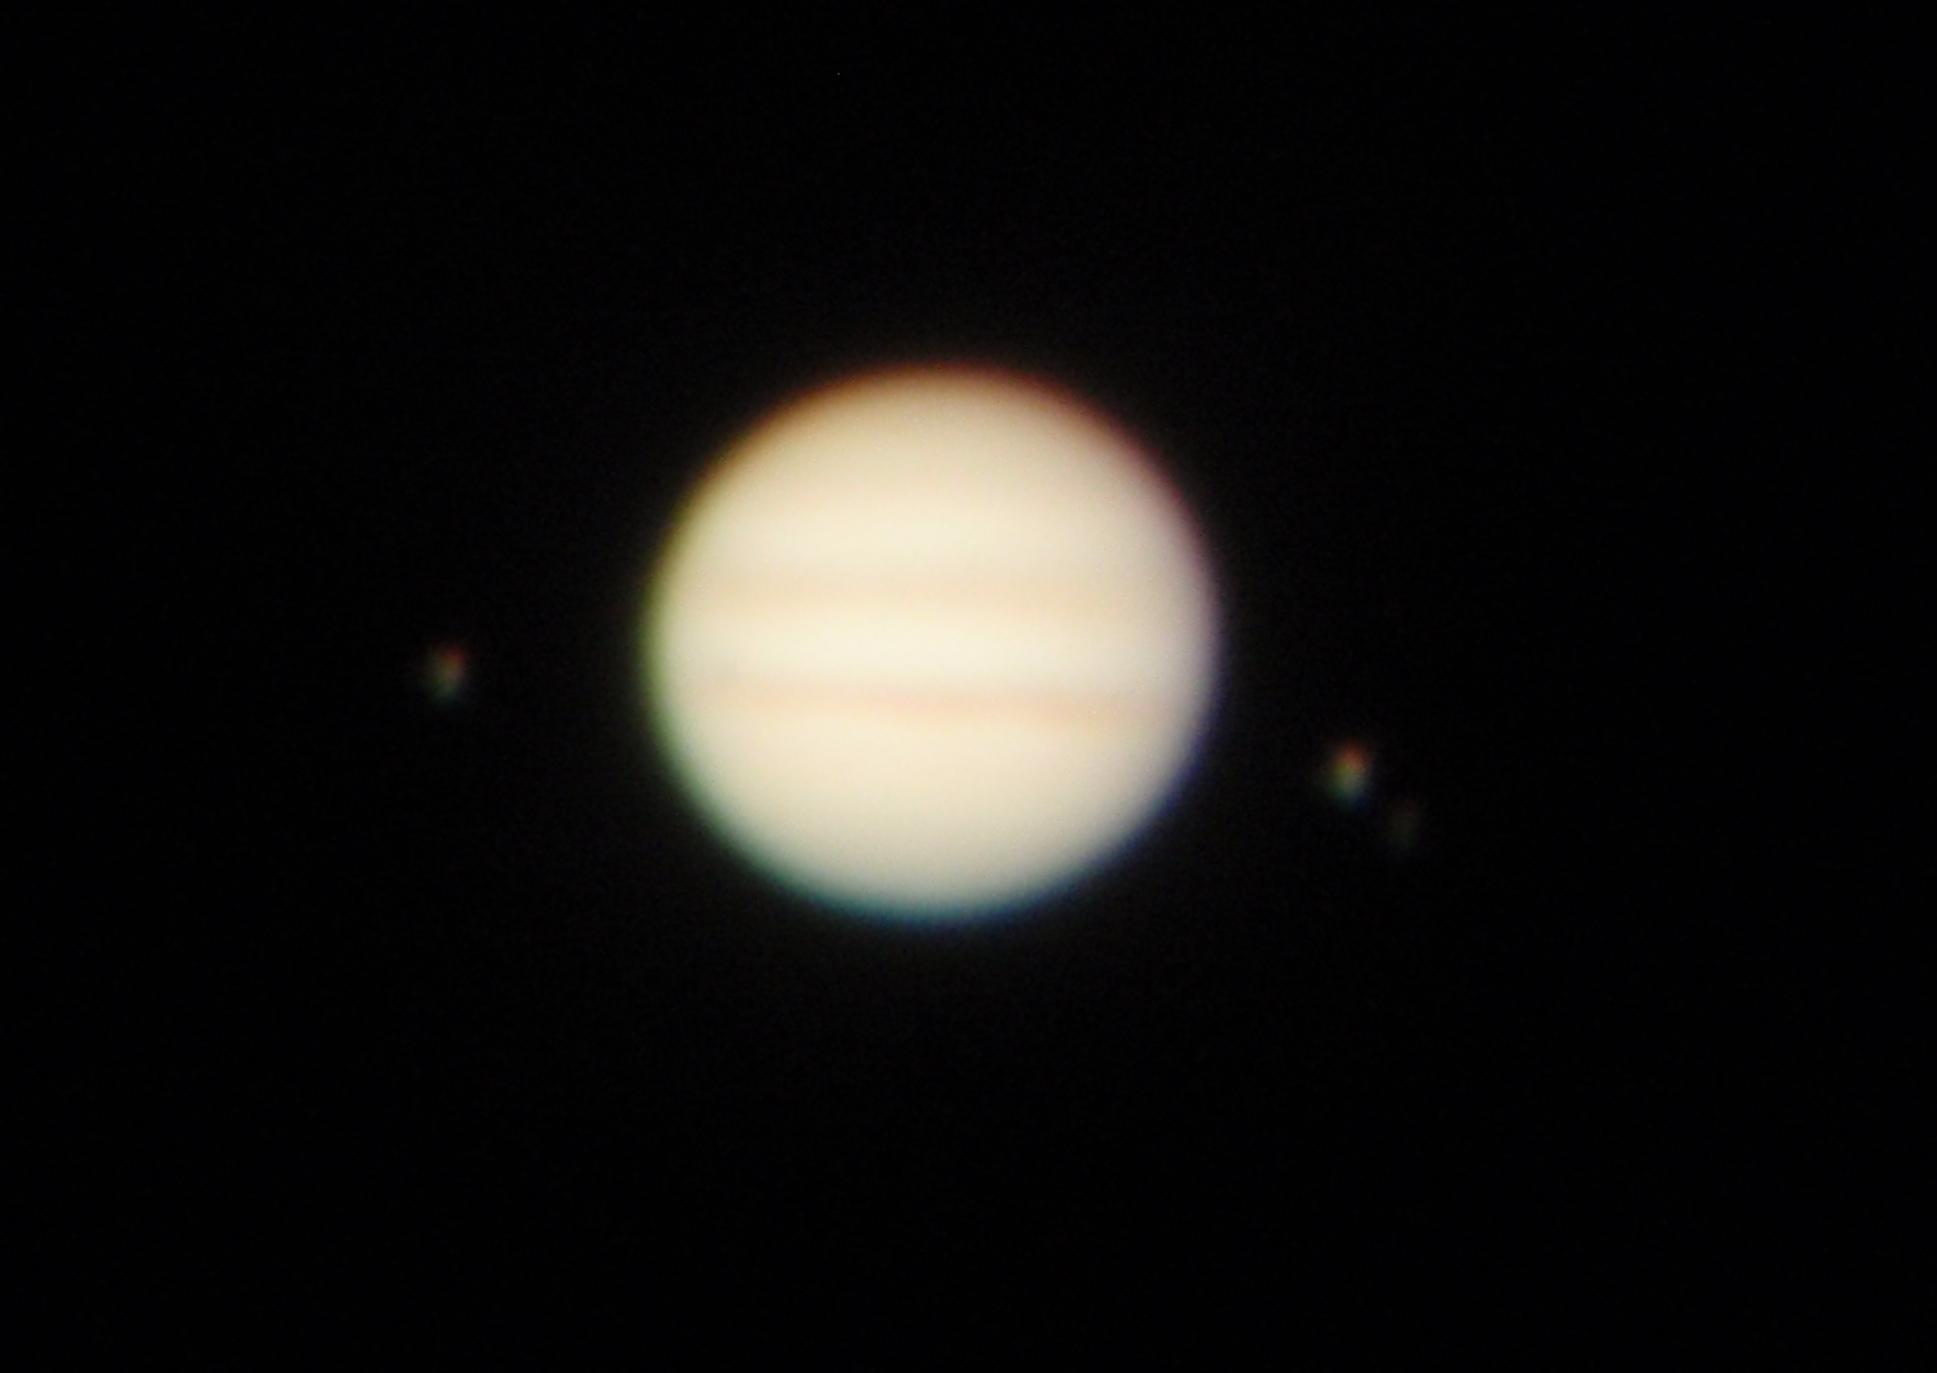 jupiter moon thebe - photo #35